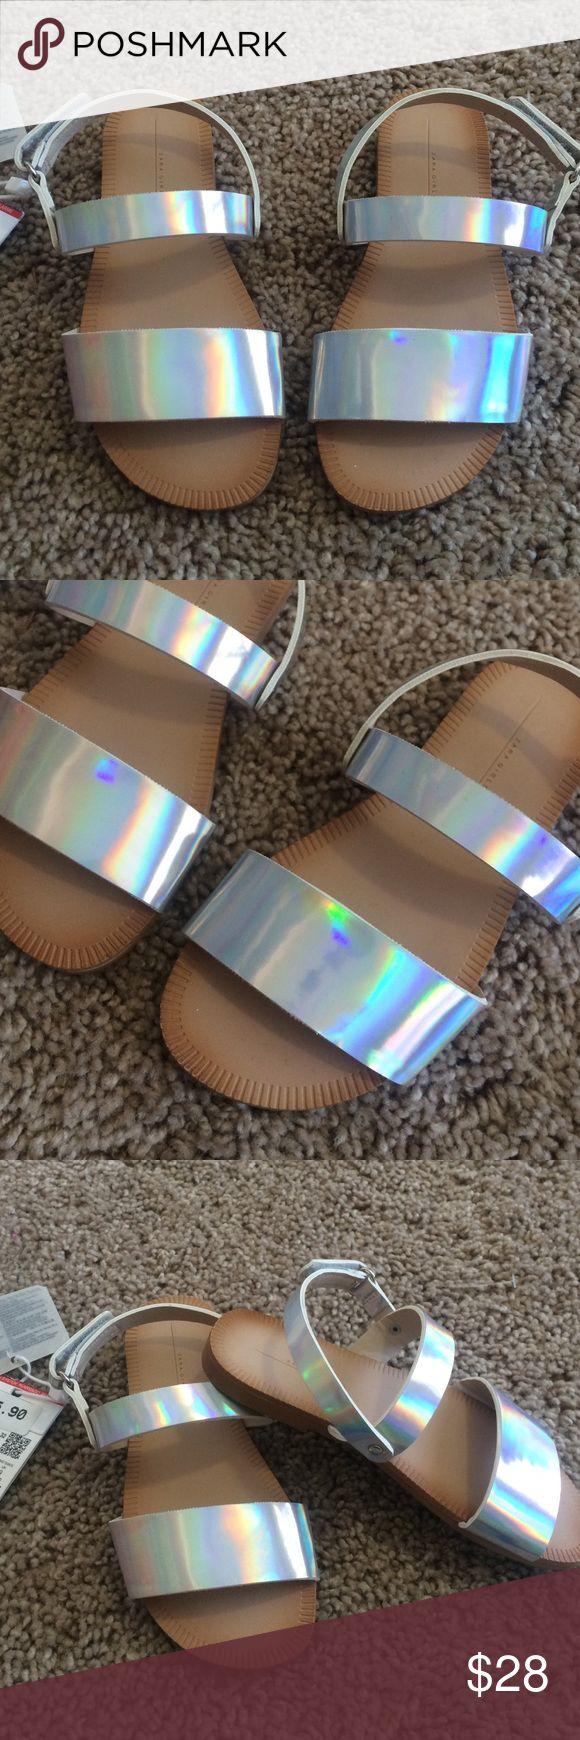 Zara girl metallic sandals. Size 26 NWT Zara metallic sandals. Size 26 may for a size 8 1/2-9 in toddler girls. Zara Shoes Sandals & Flip Flops